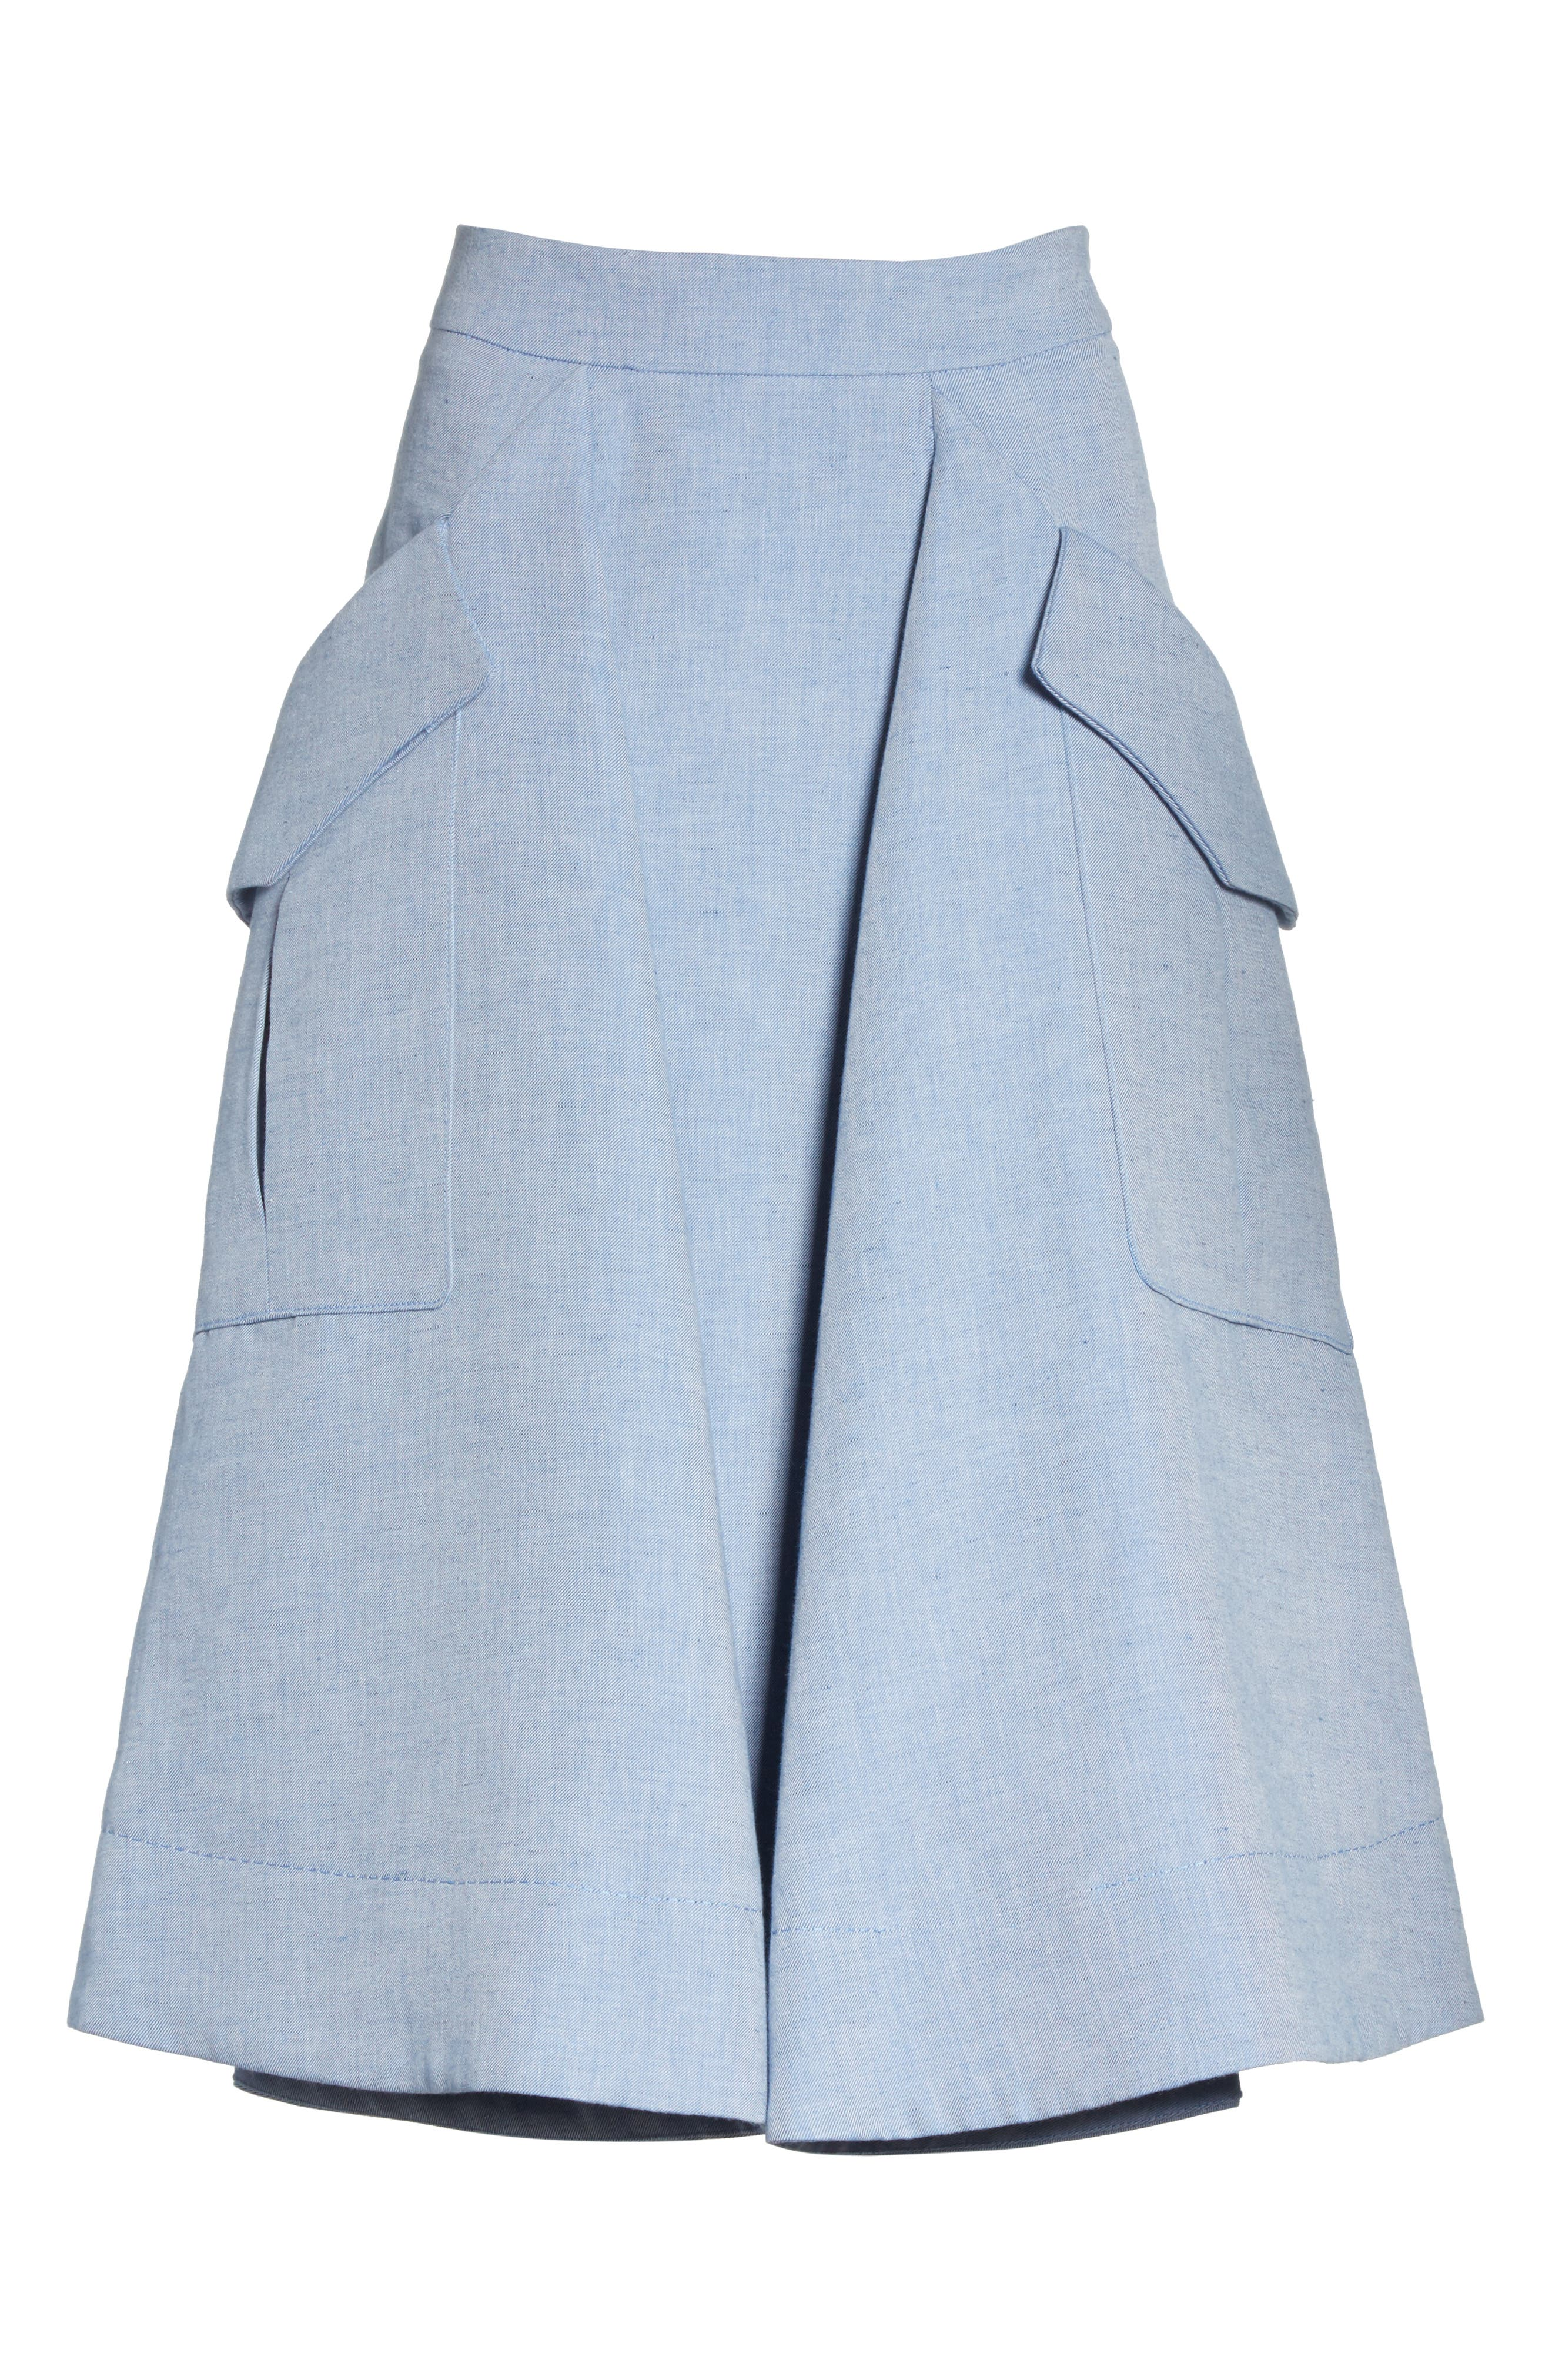 Jupe Genou Skirt,                             Alternate thumbnail 6, color,                             Bleu Acier